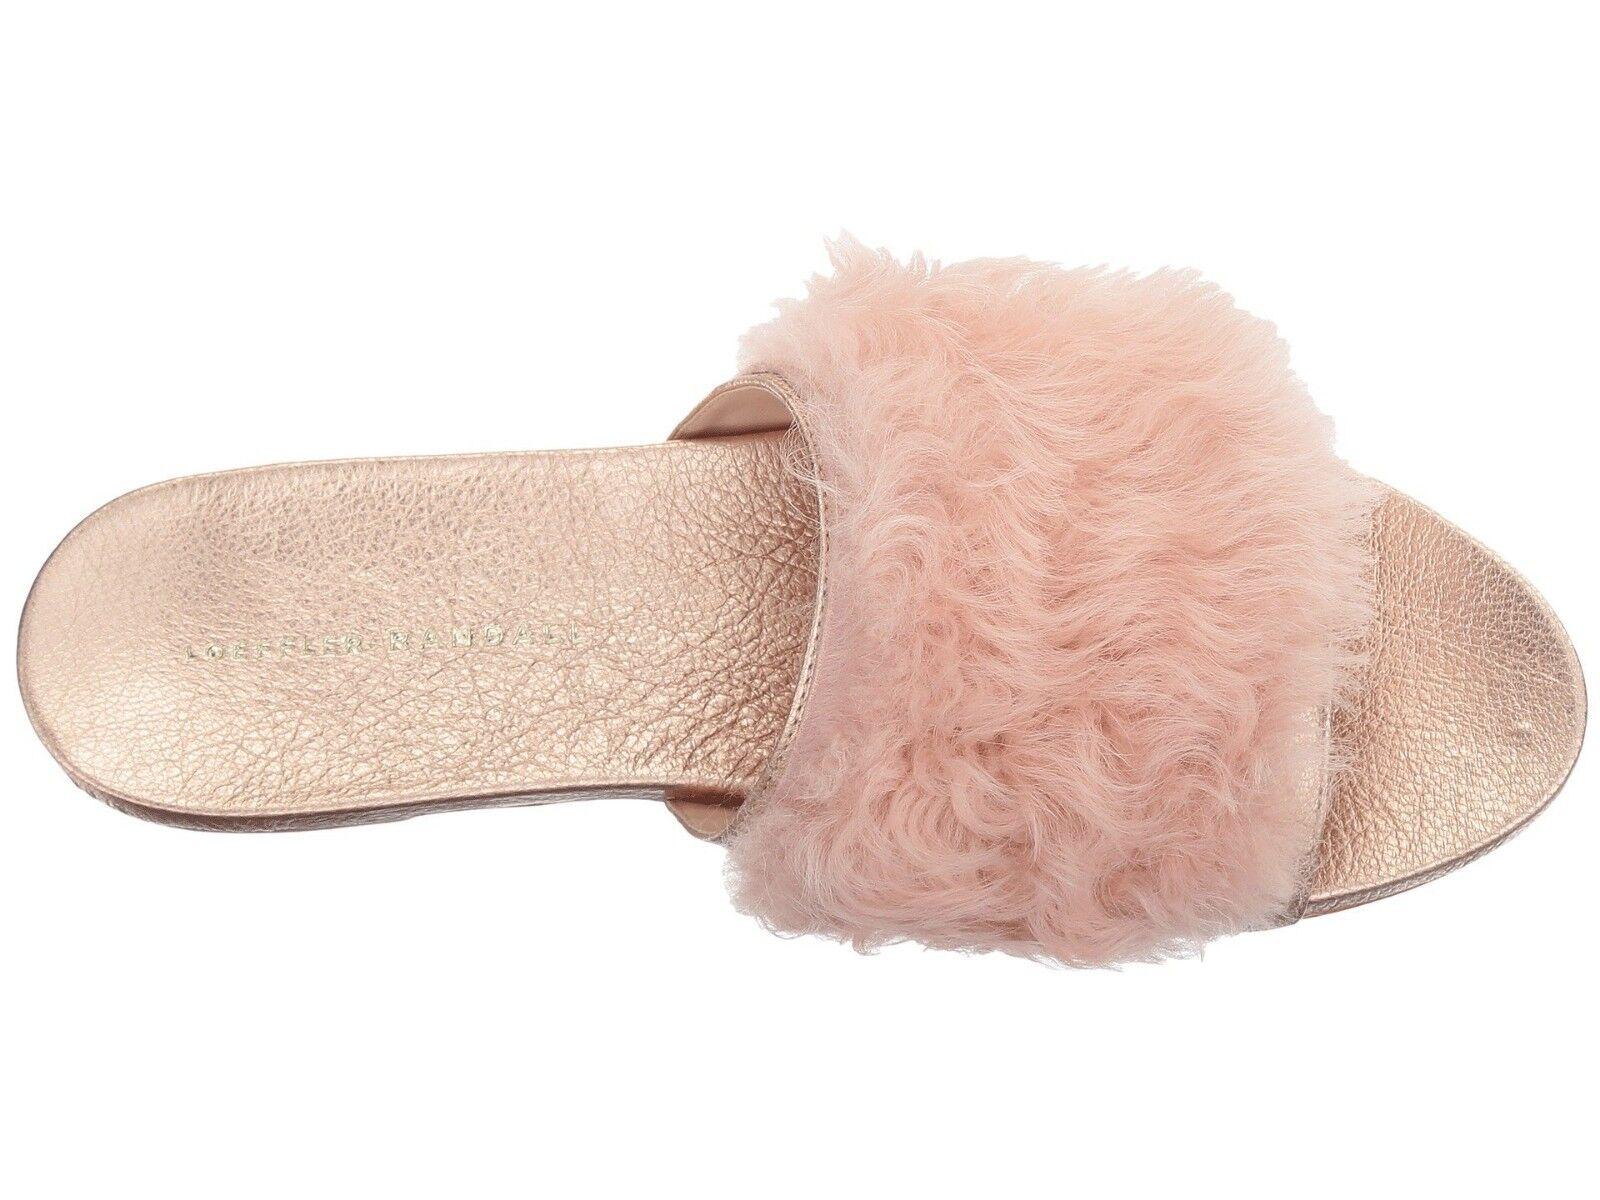 Loeffler Randall  Domino Flat Shearling Slide Pink  Rose 38/8 MSRP  Pink 395.00 1744a5